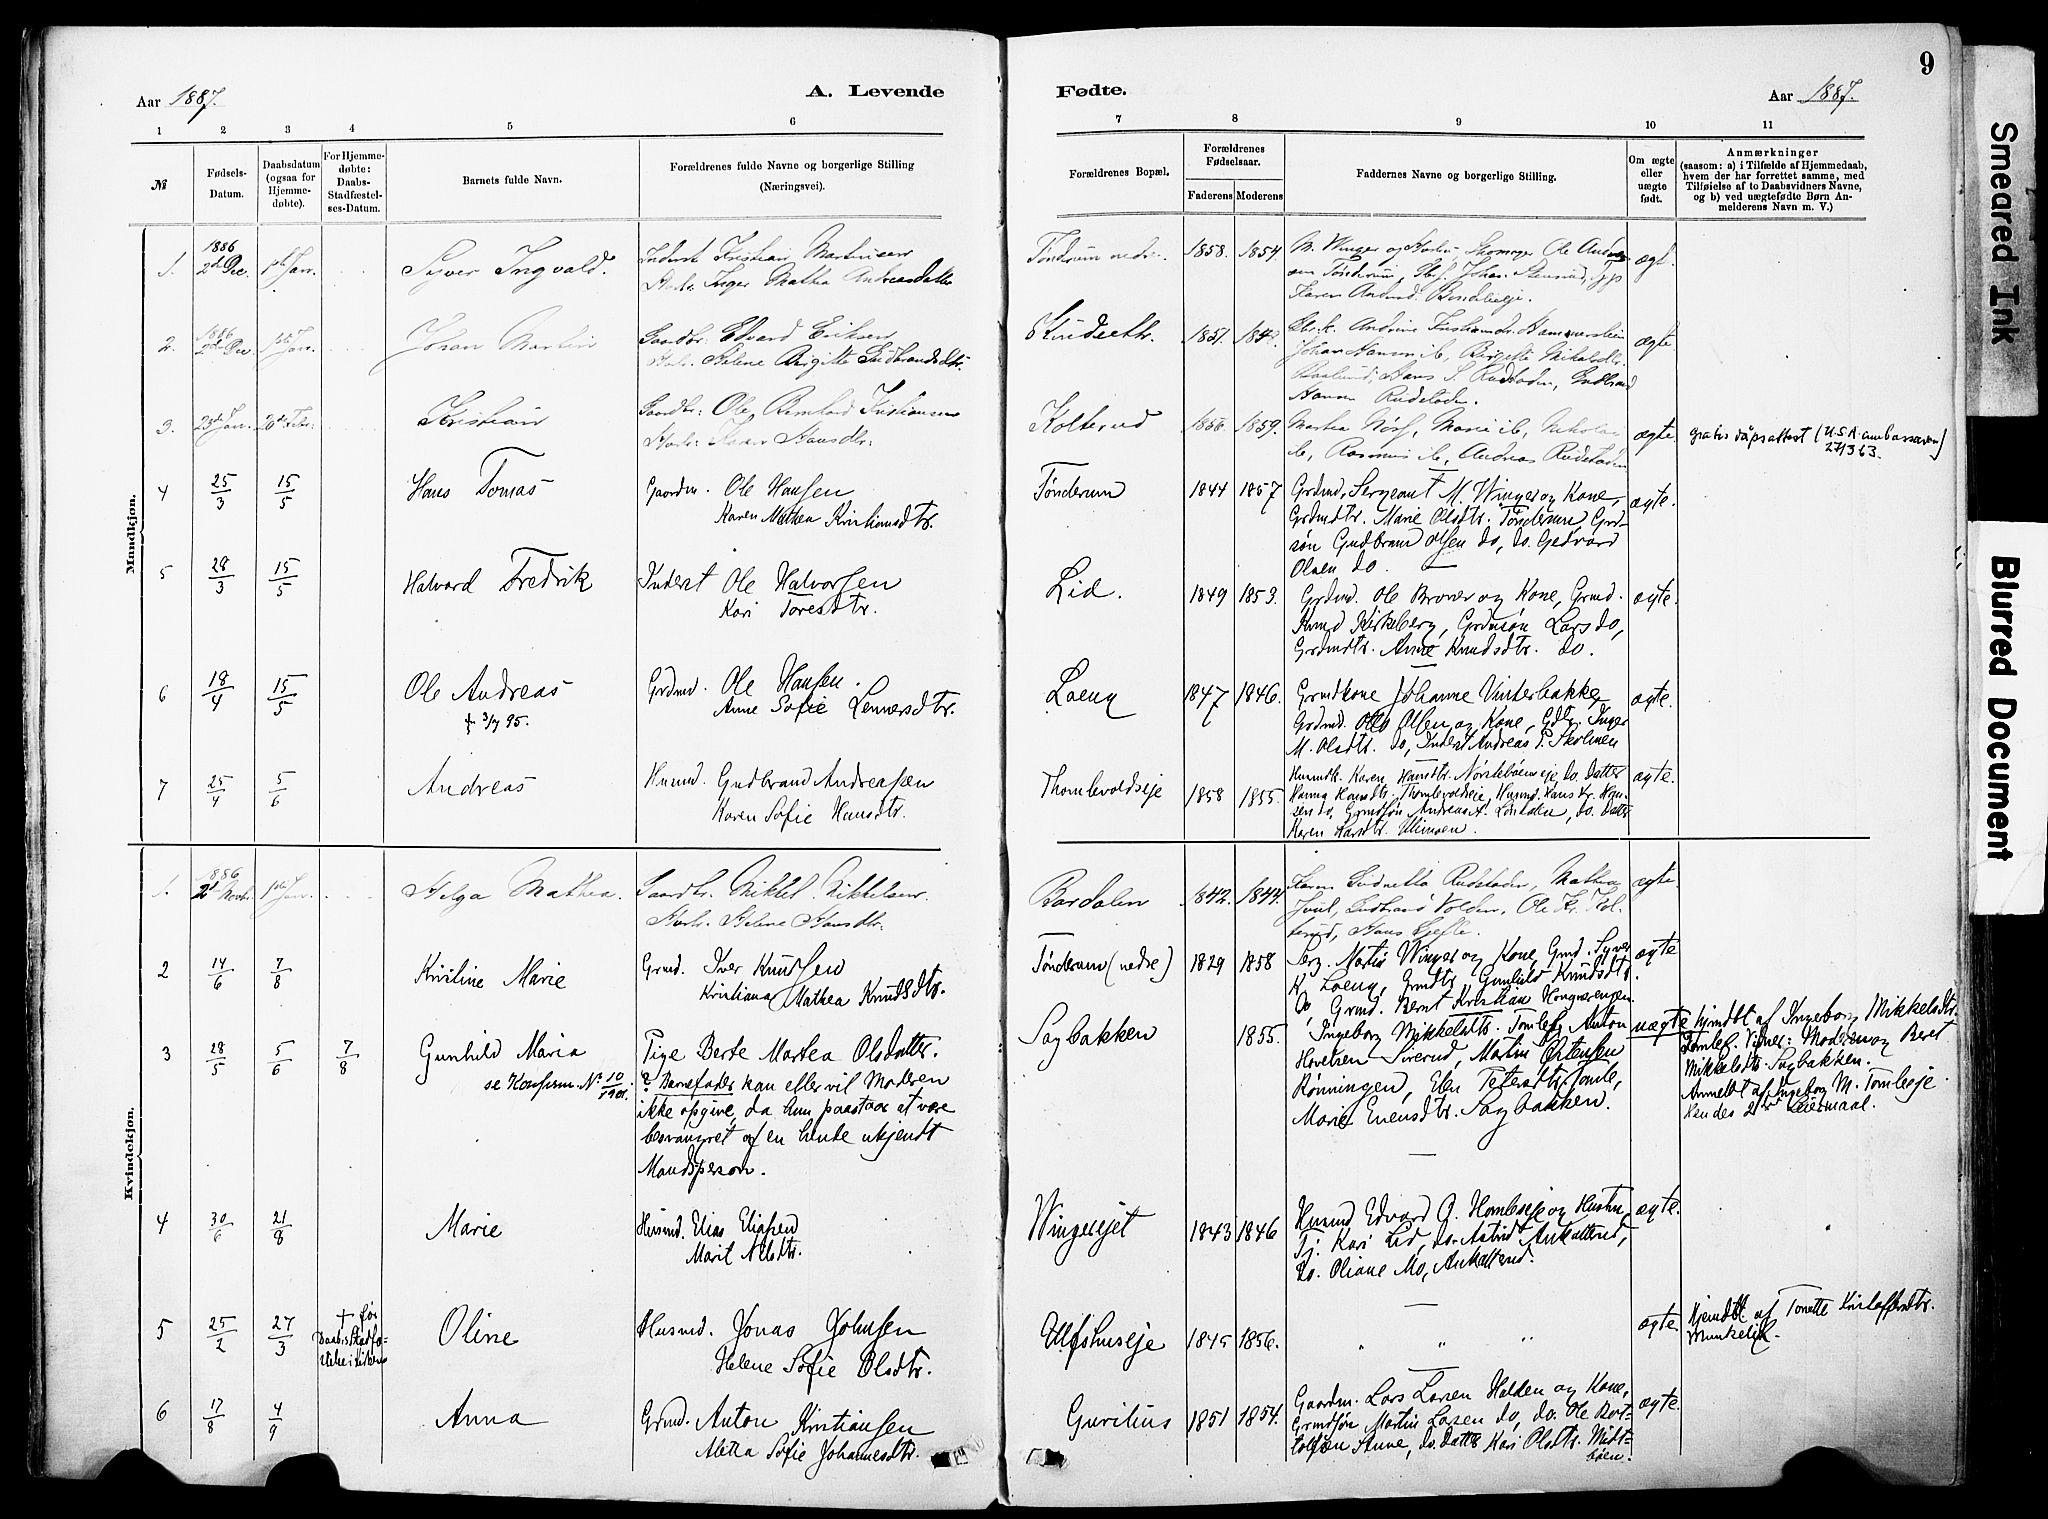 SAH, Nordre Land prestekontor, Ministerialbok nr. 5, 1882-1903, s. 9